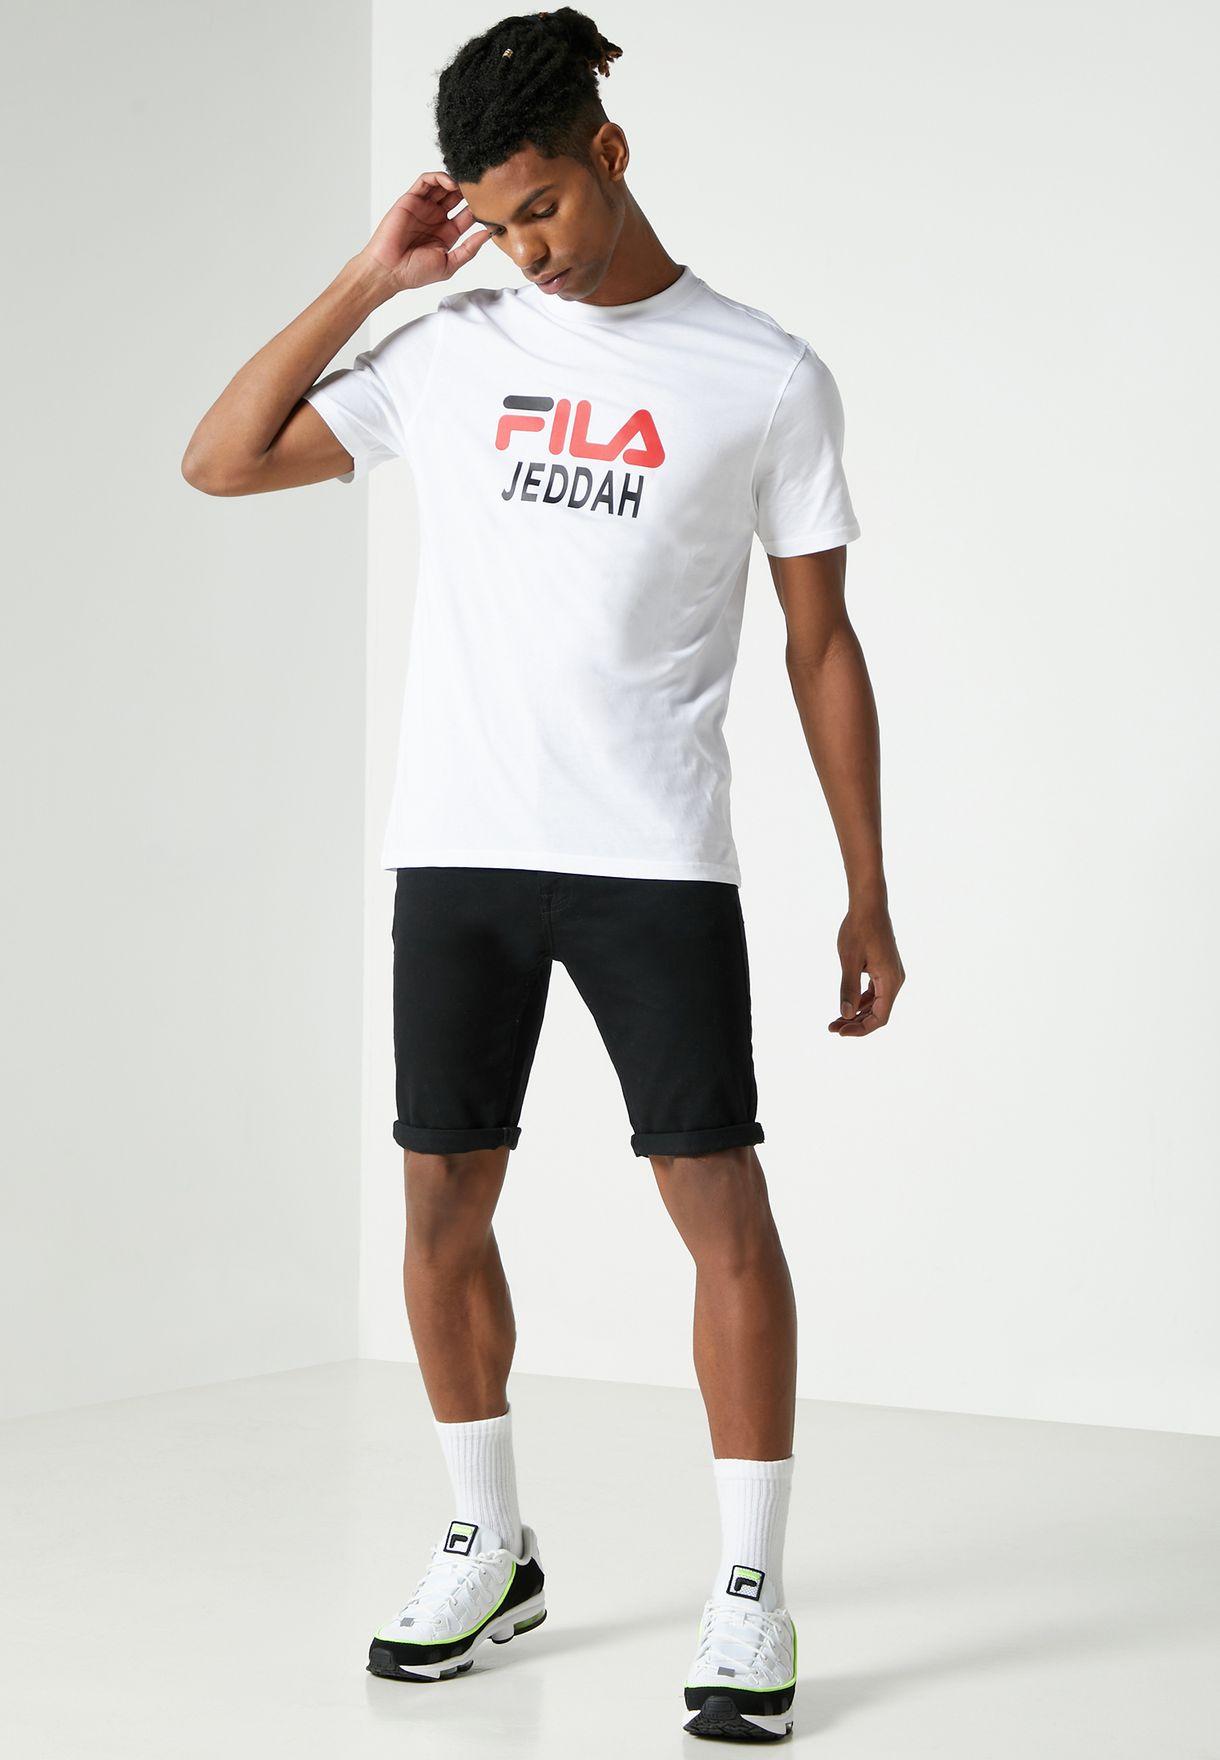 Jeddah T-Shirt